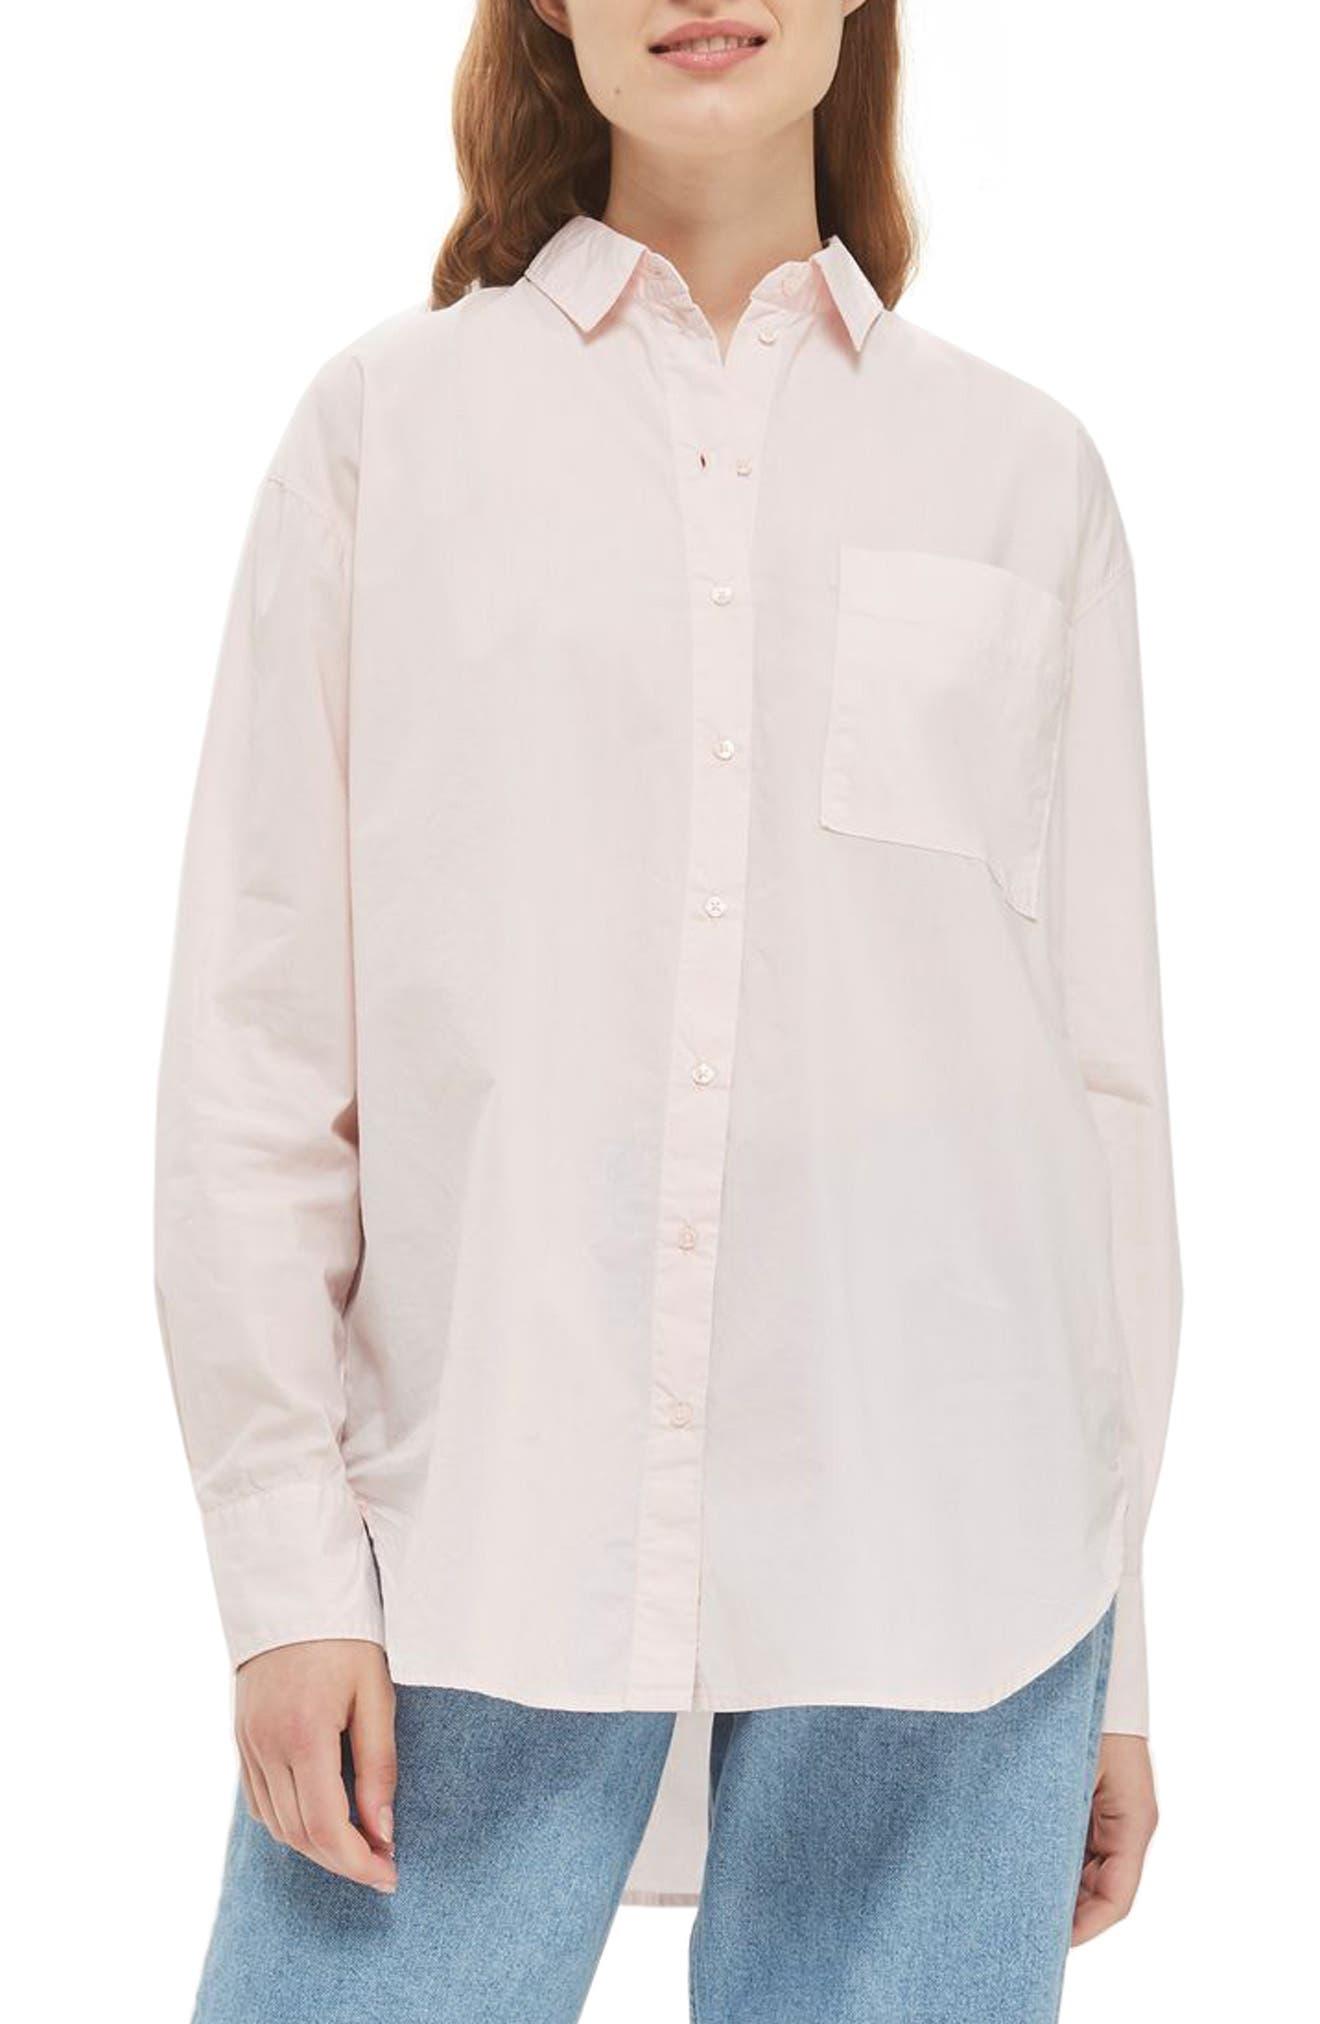 Olly Oversize Poplin Shirt,                         Main,                         color, Light Pink